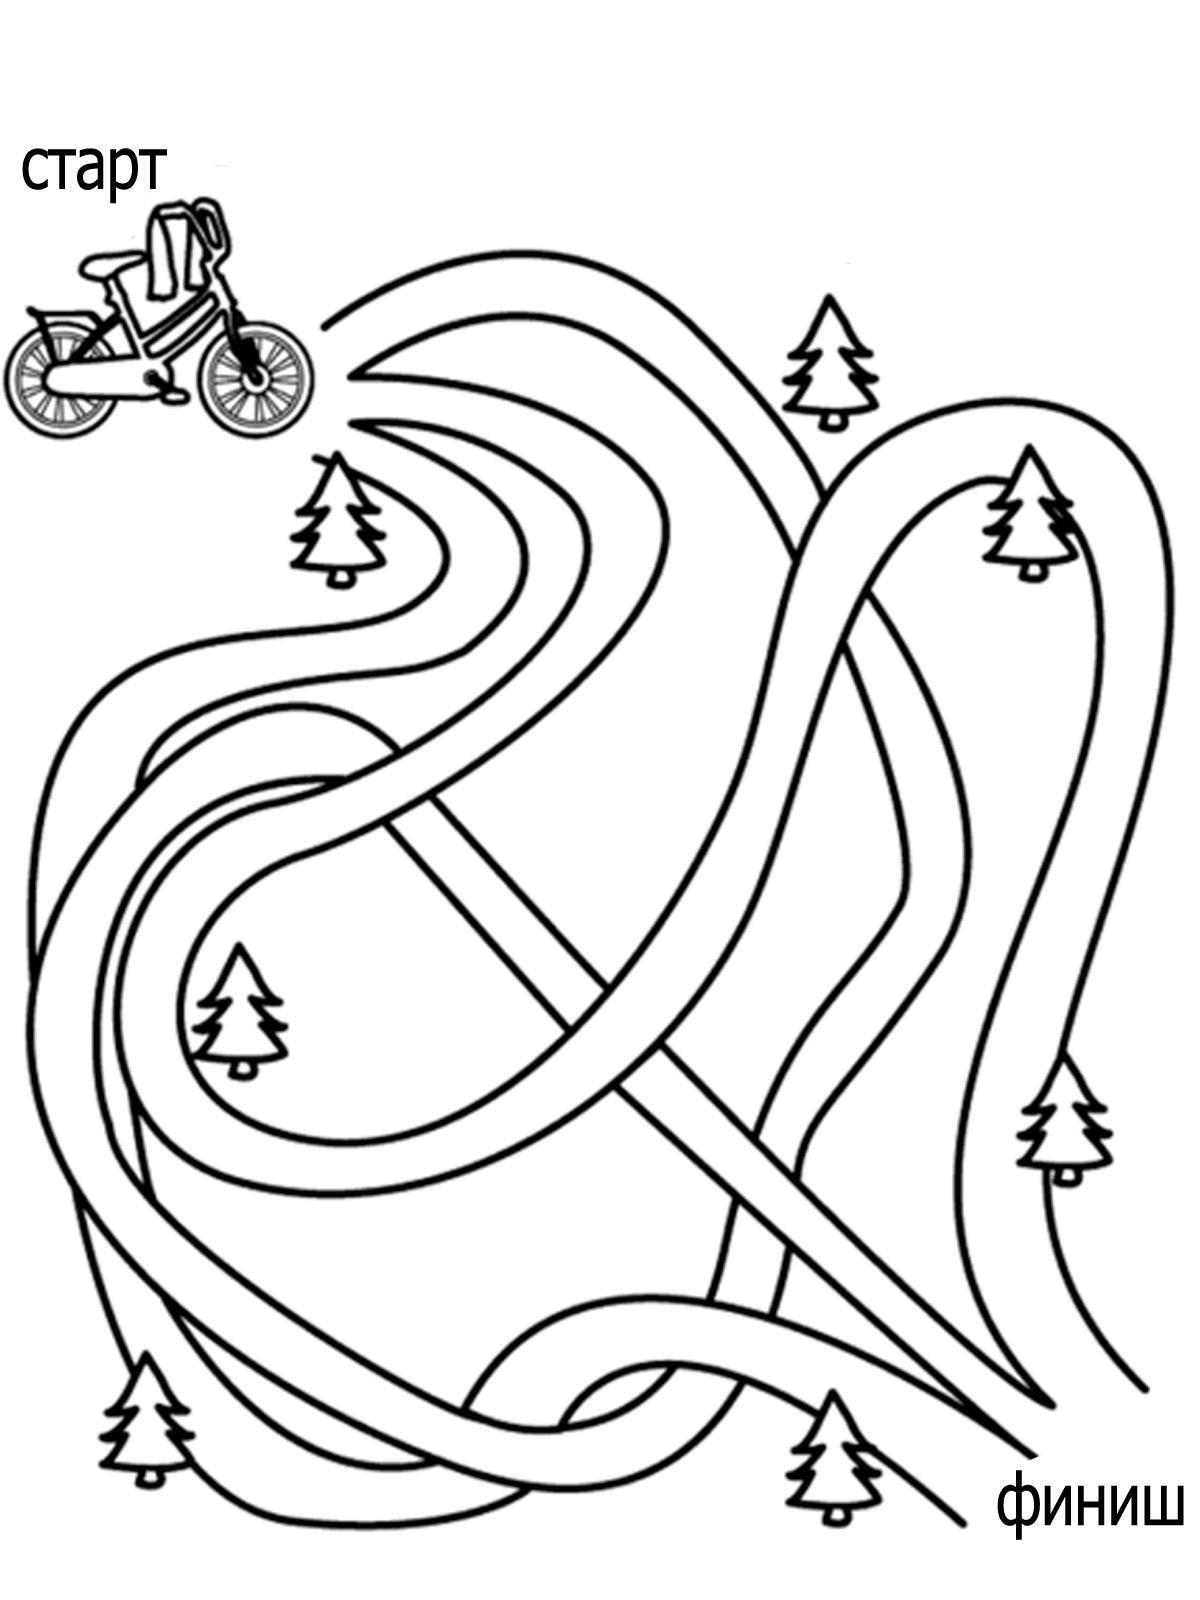 Раскраски лабиринт детская раскраска-лабиринт, доберись до финиша